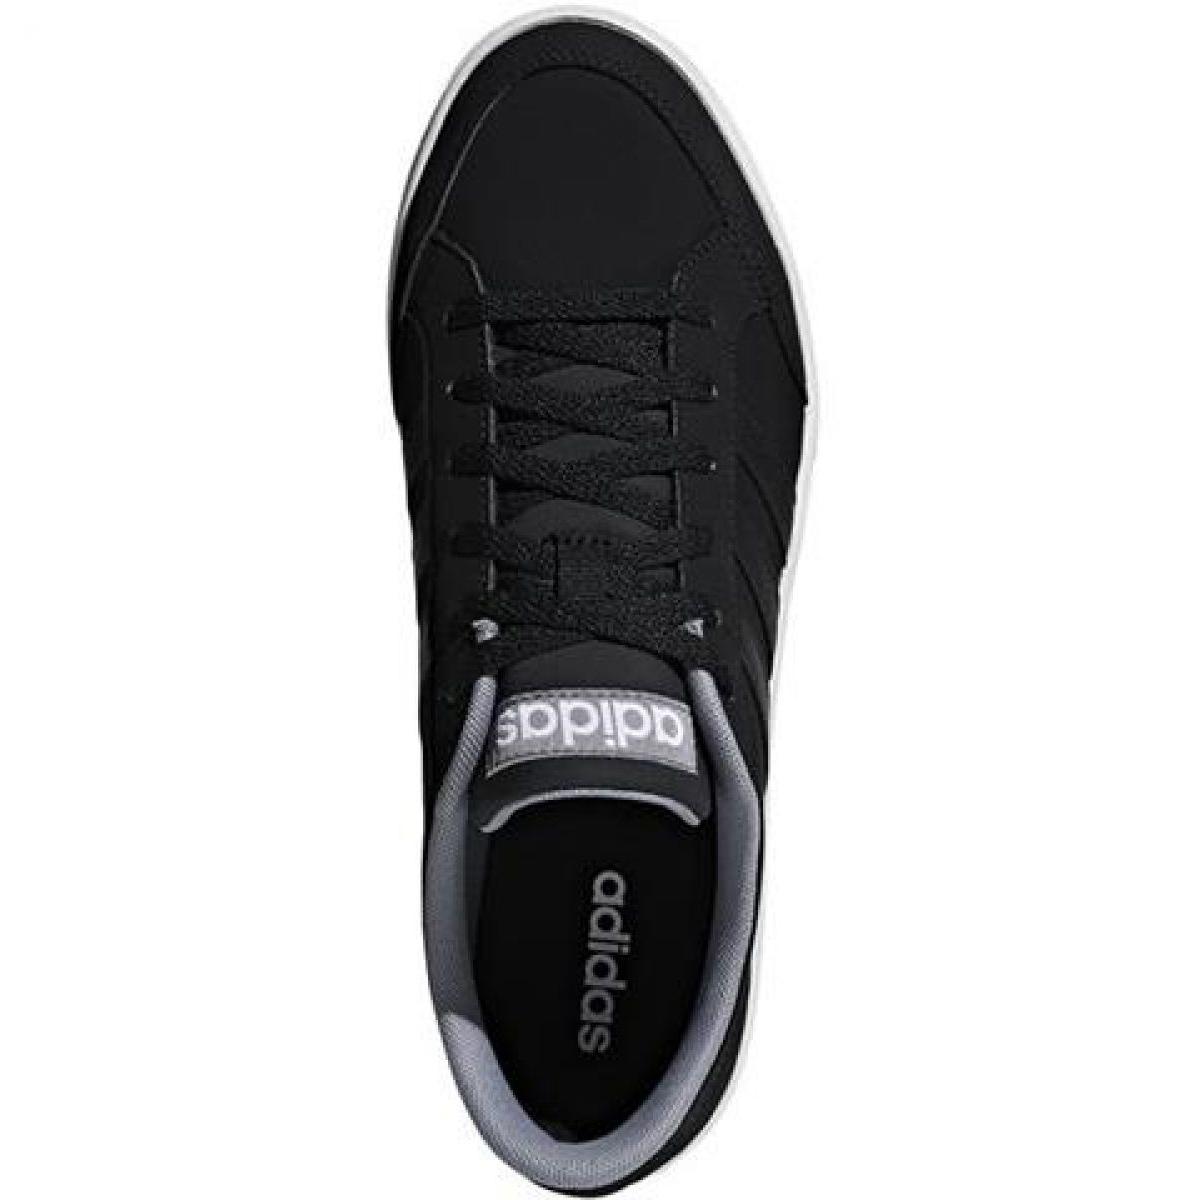 miniature 2 - Adidas Vs Set M F34370 chaussures noir